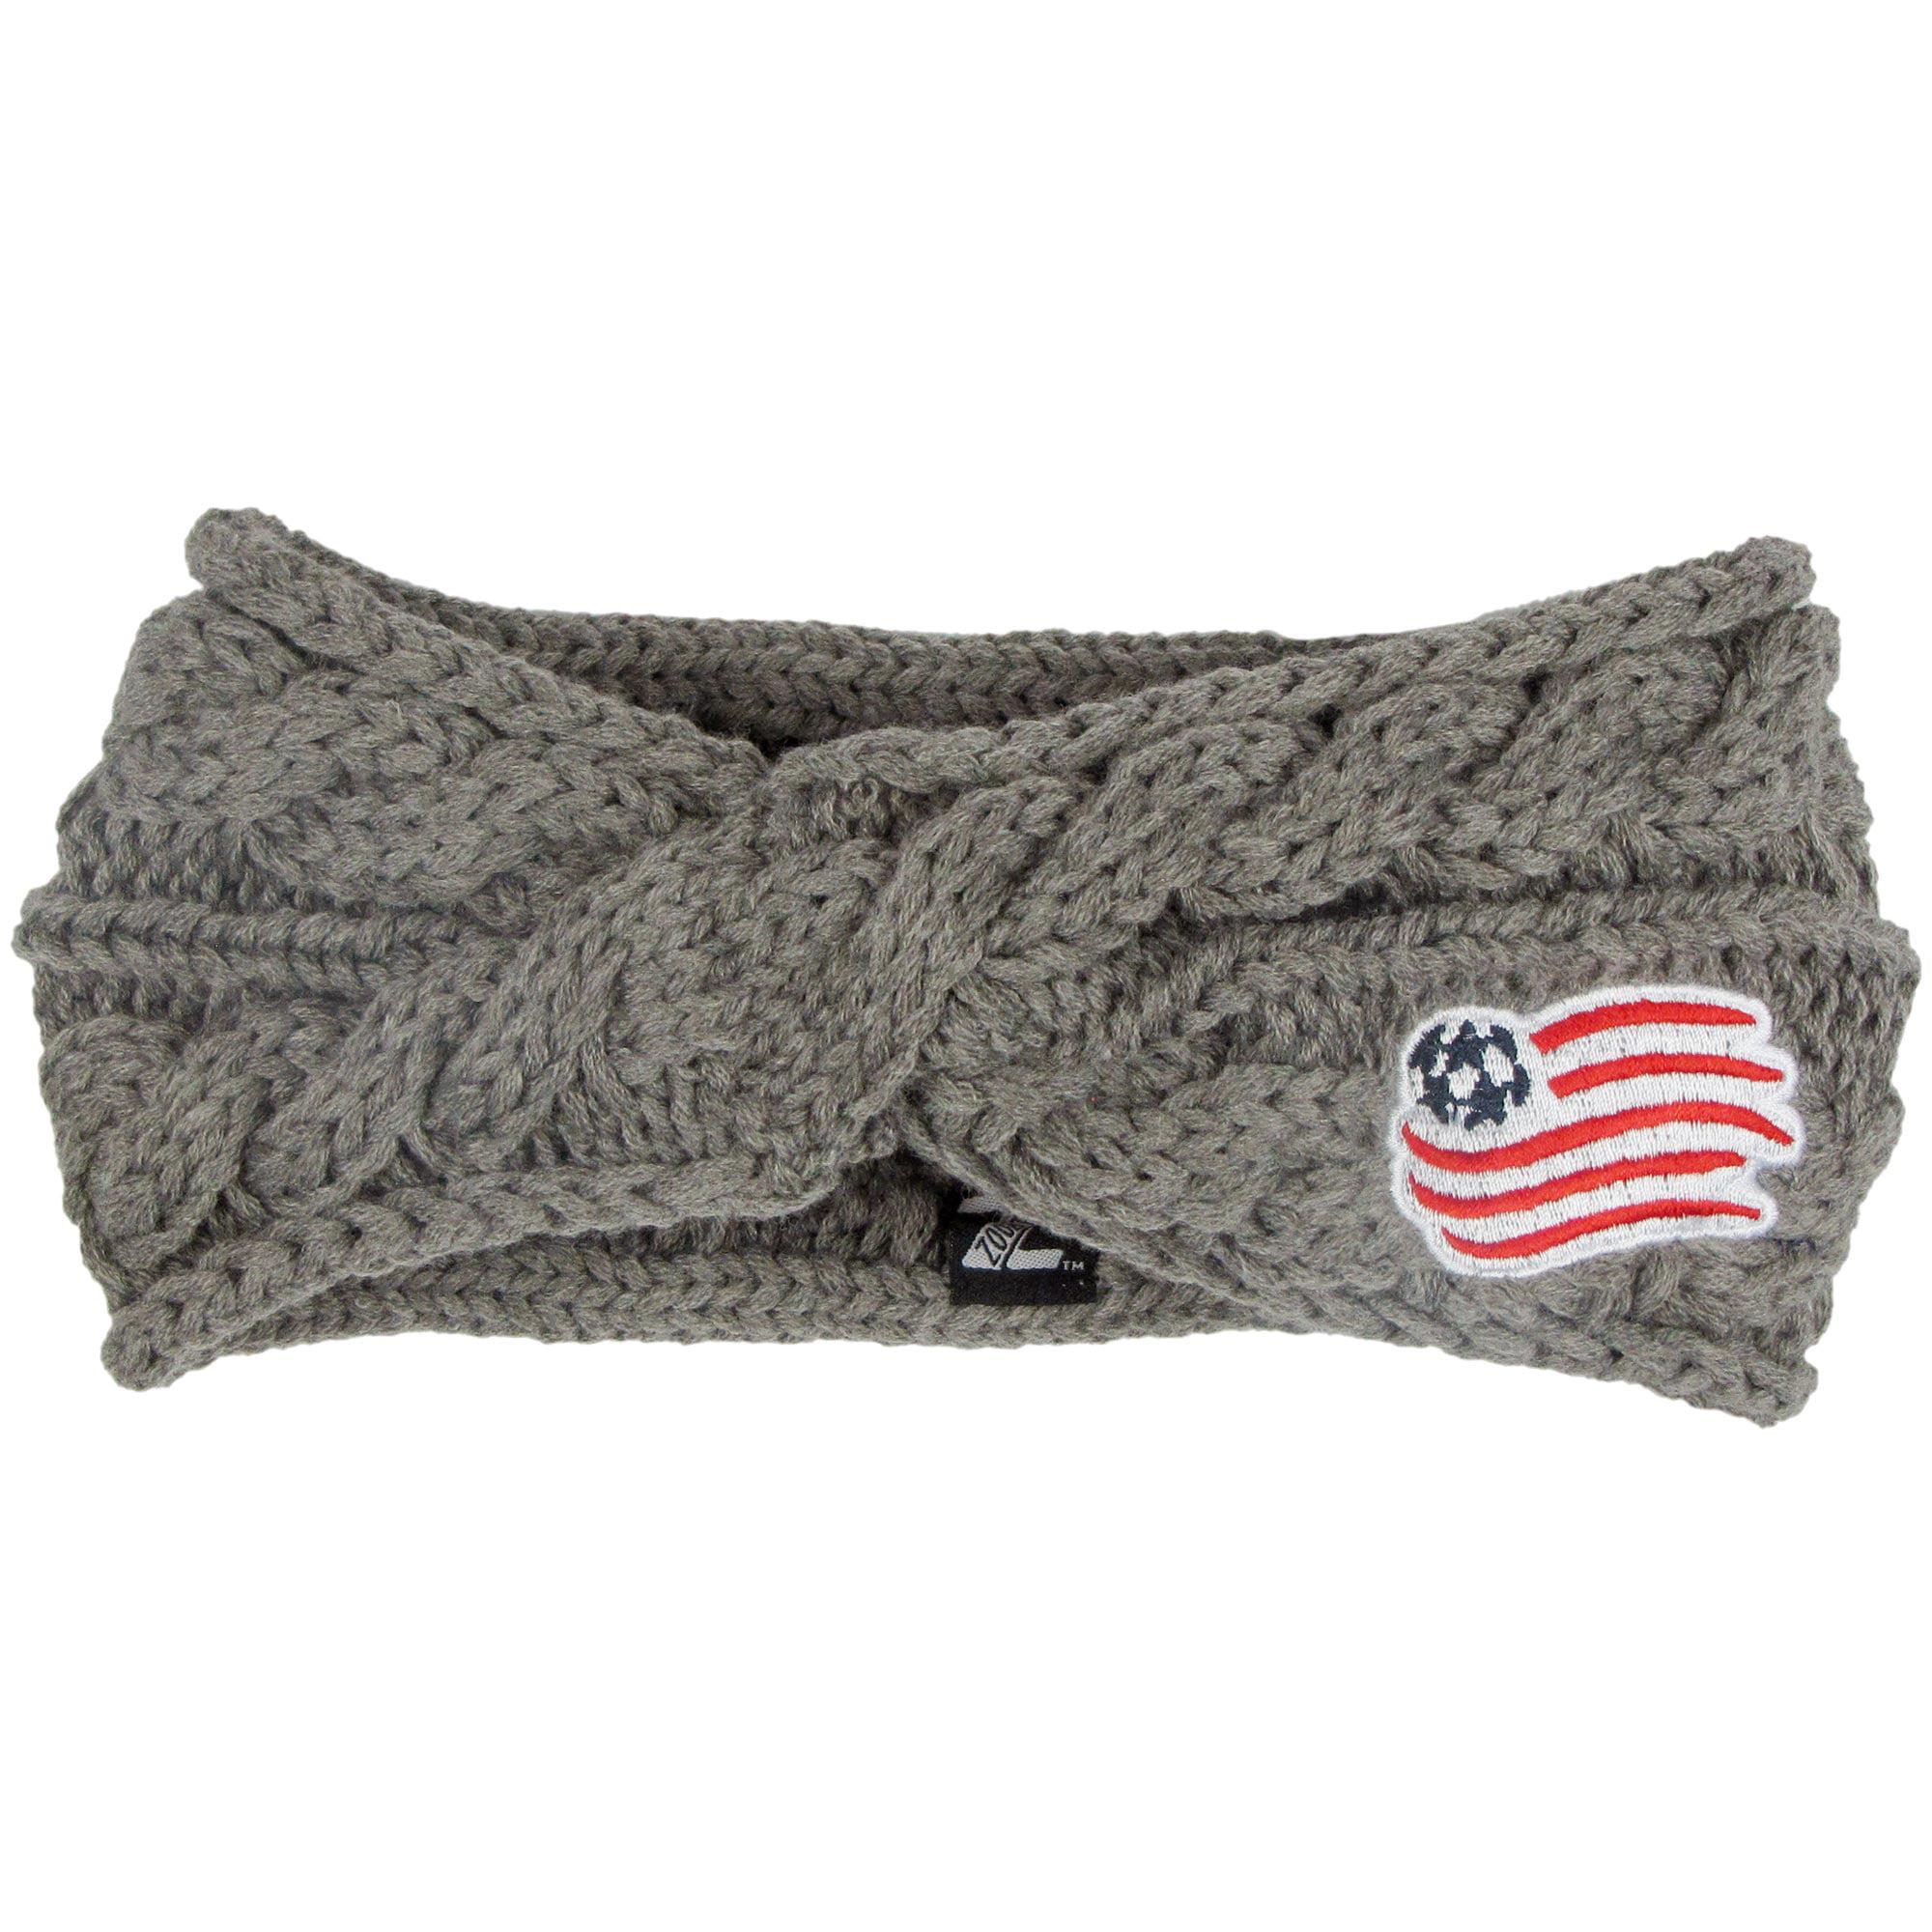 New England Revolution ZooZatz Women's Cable Headband - Charcoal - No Size